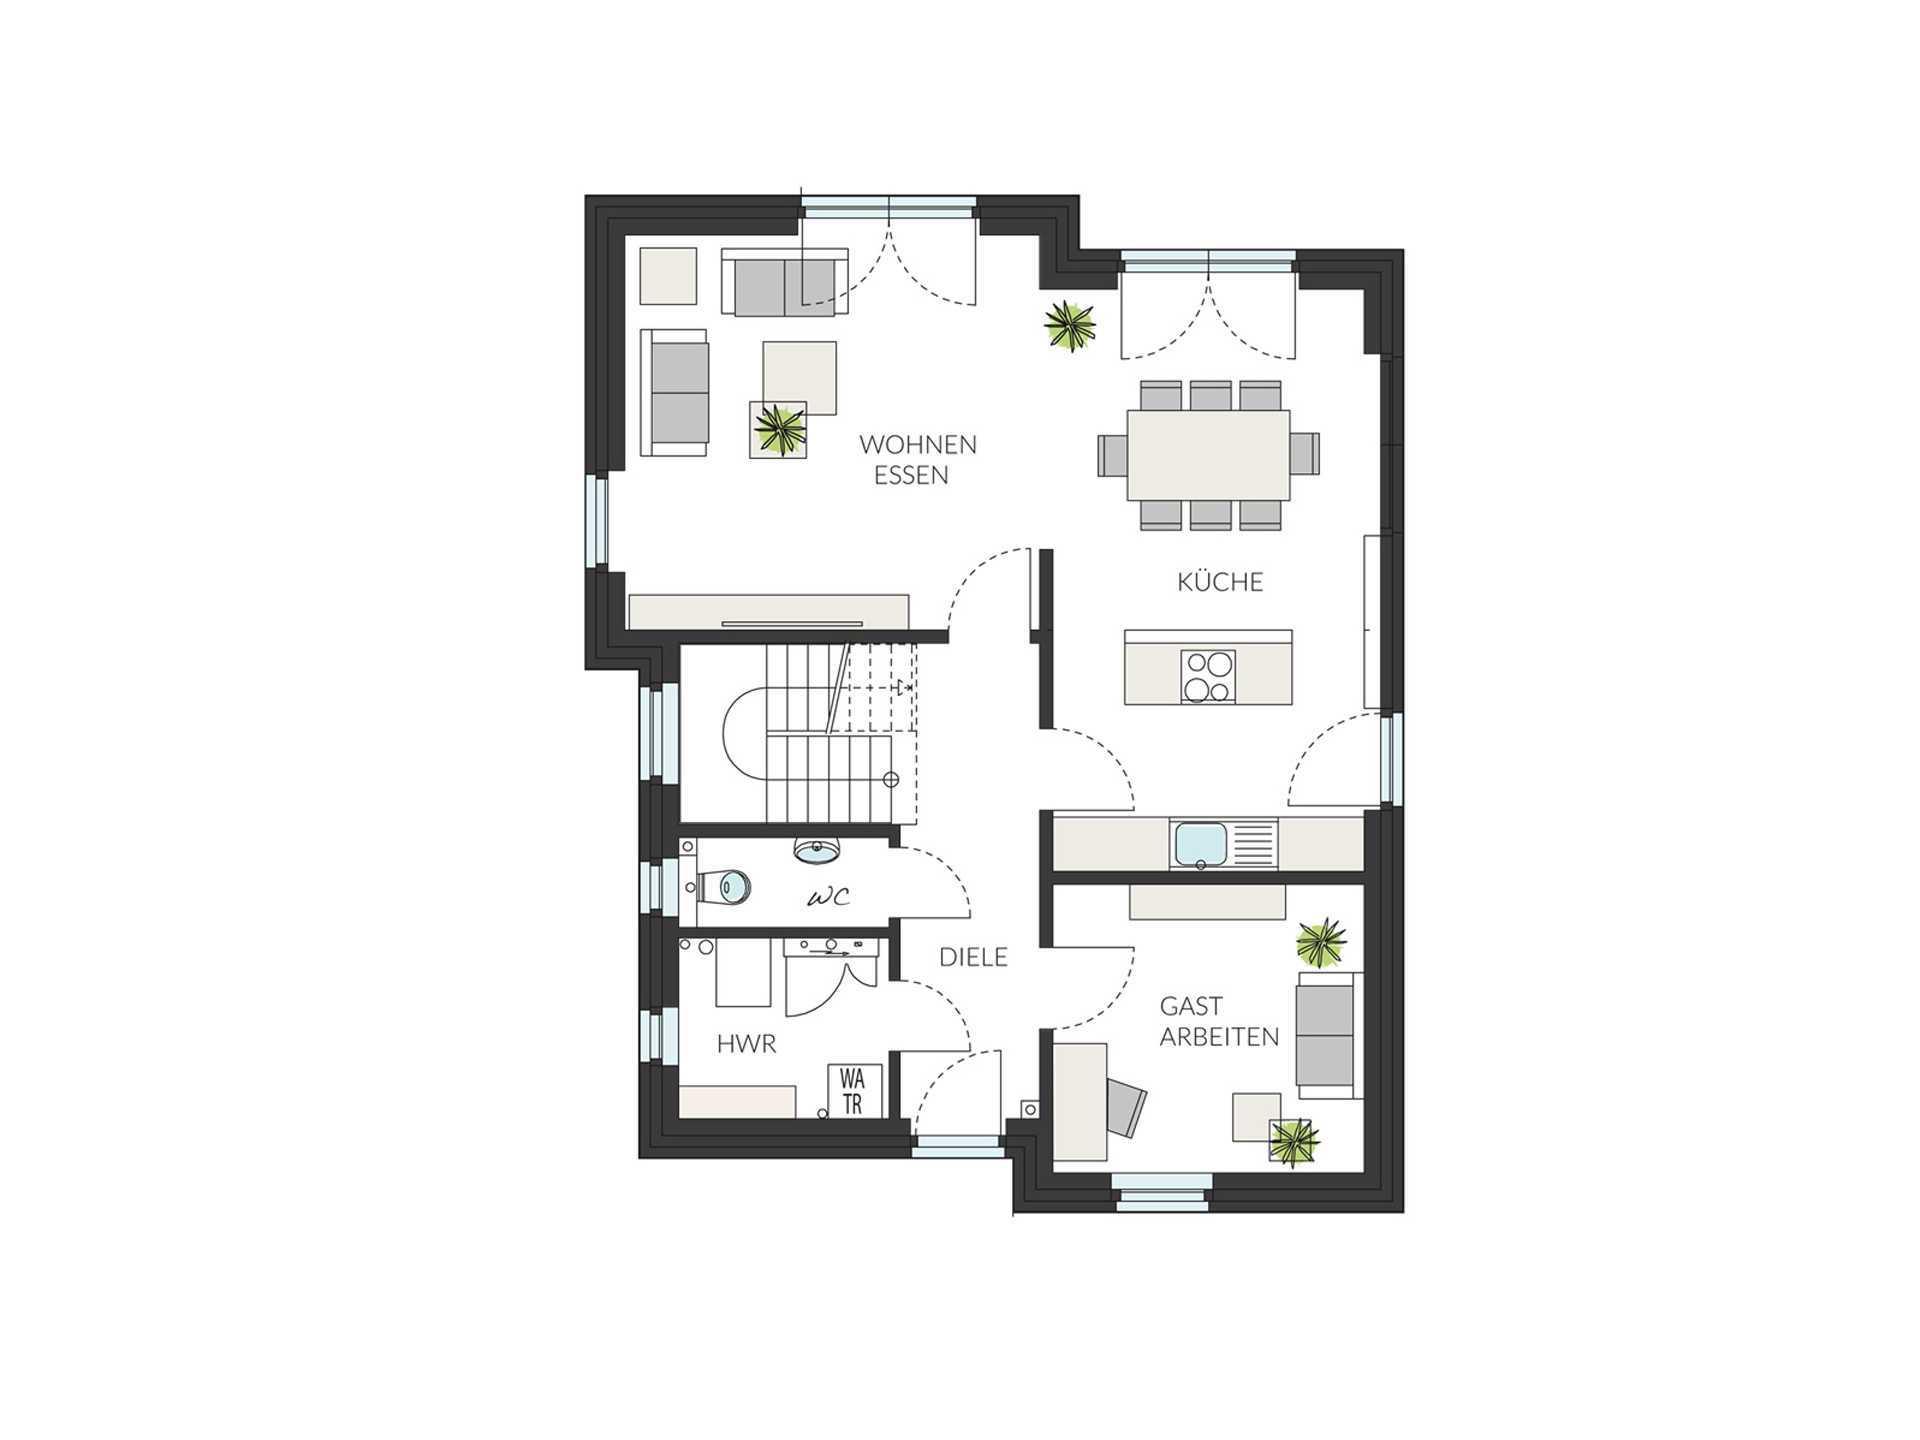 pultdachhaus prostyle 141 fg bg prohaus. Black Bedroom Furniture Sets. Home Design Ideas